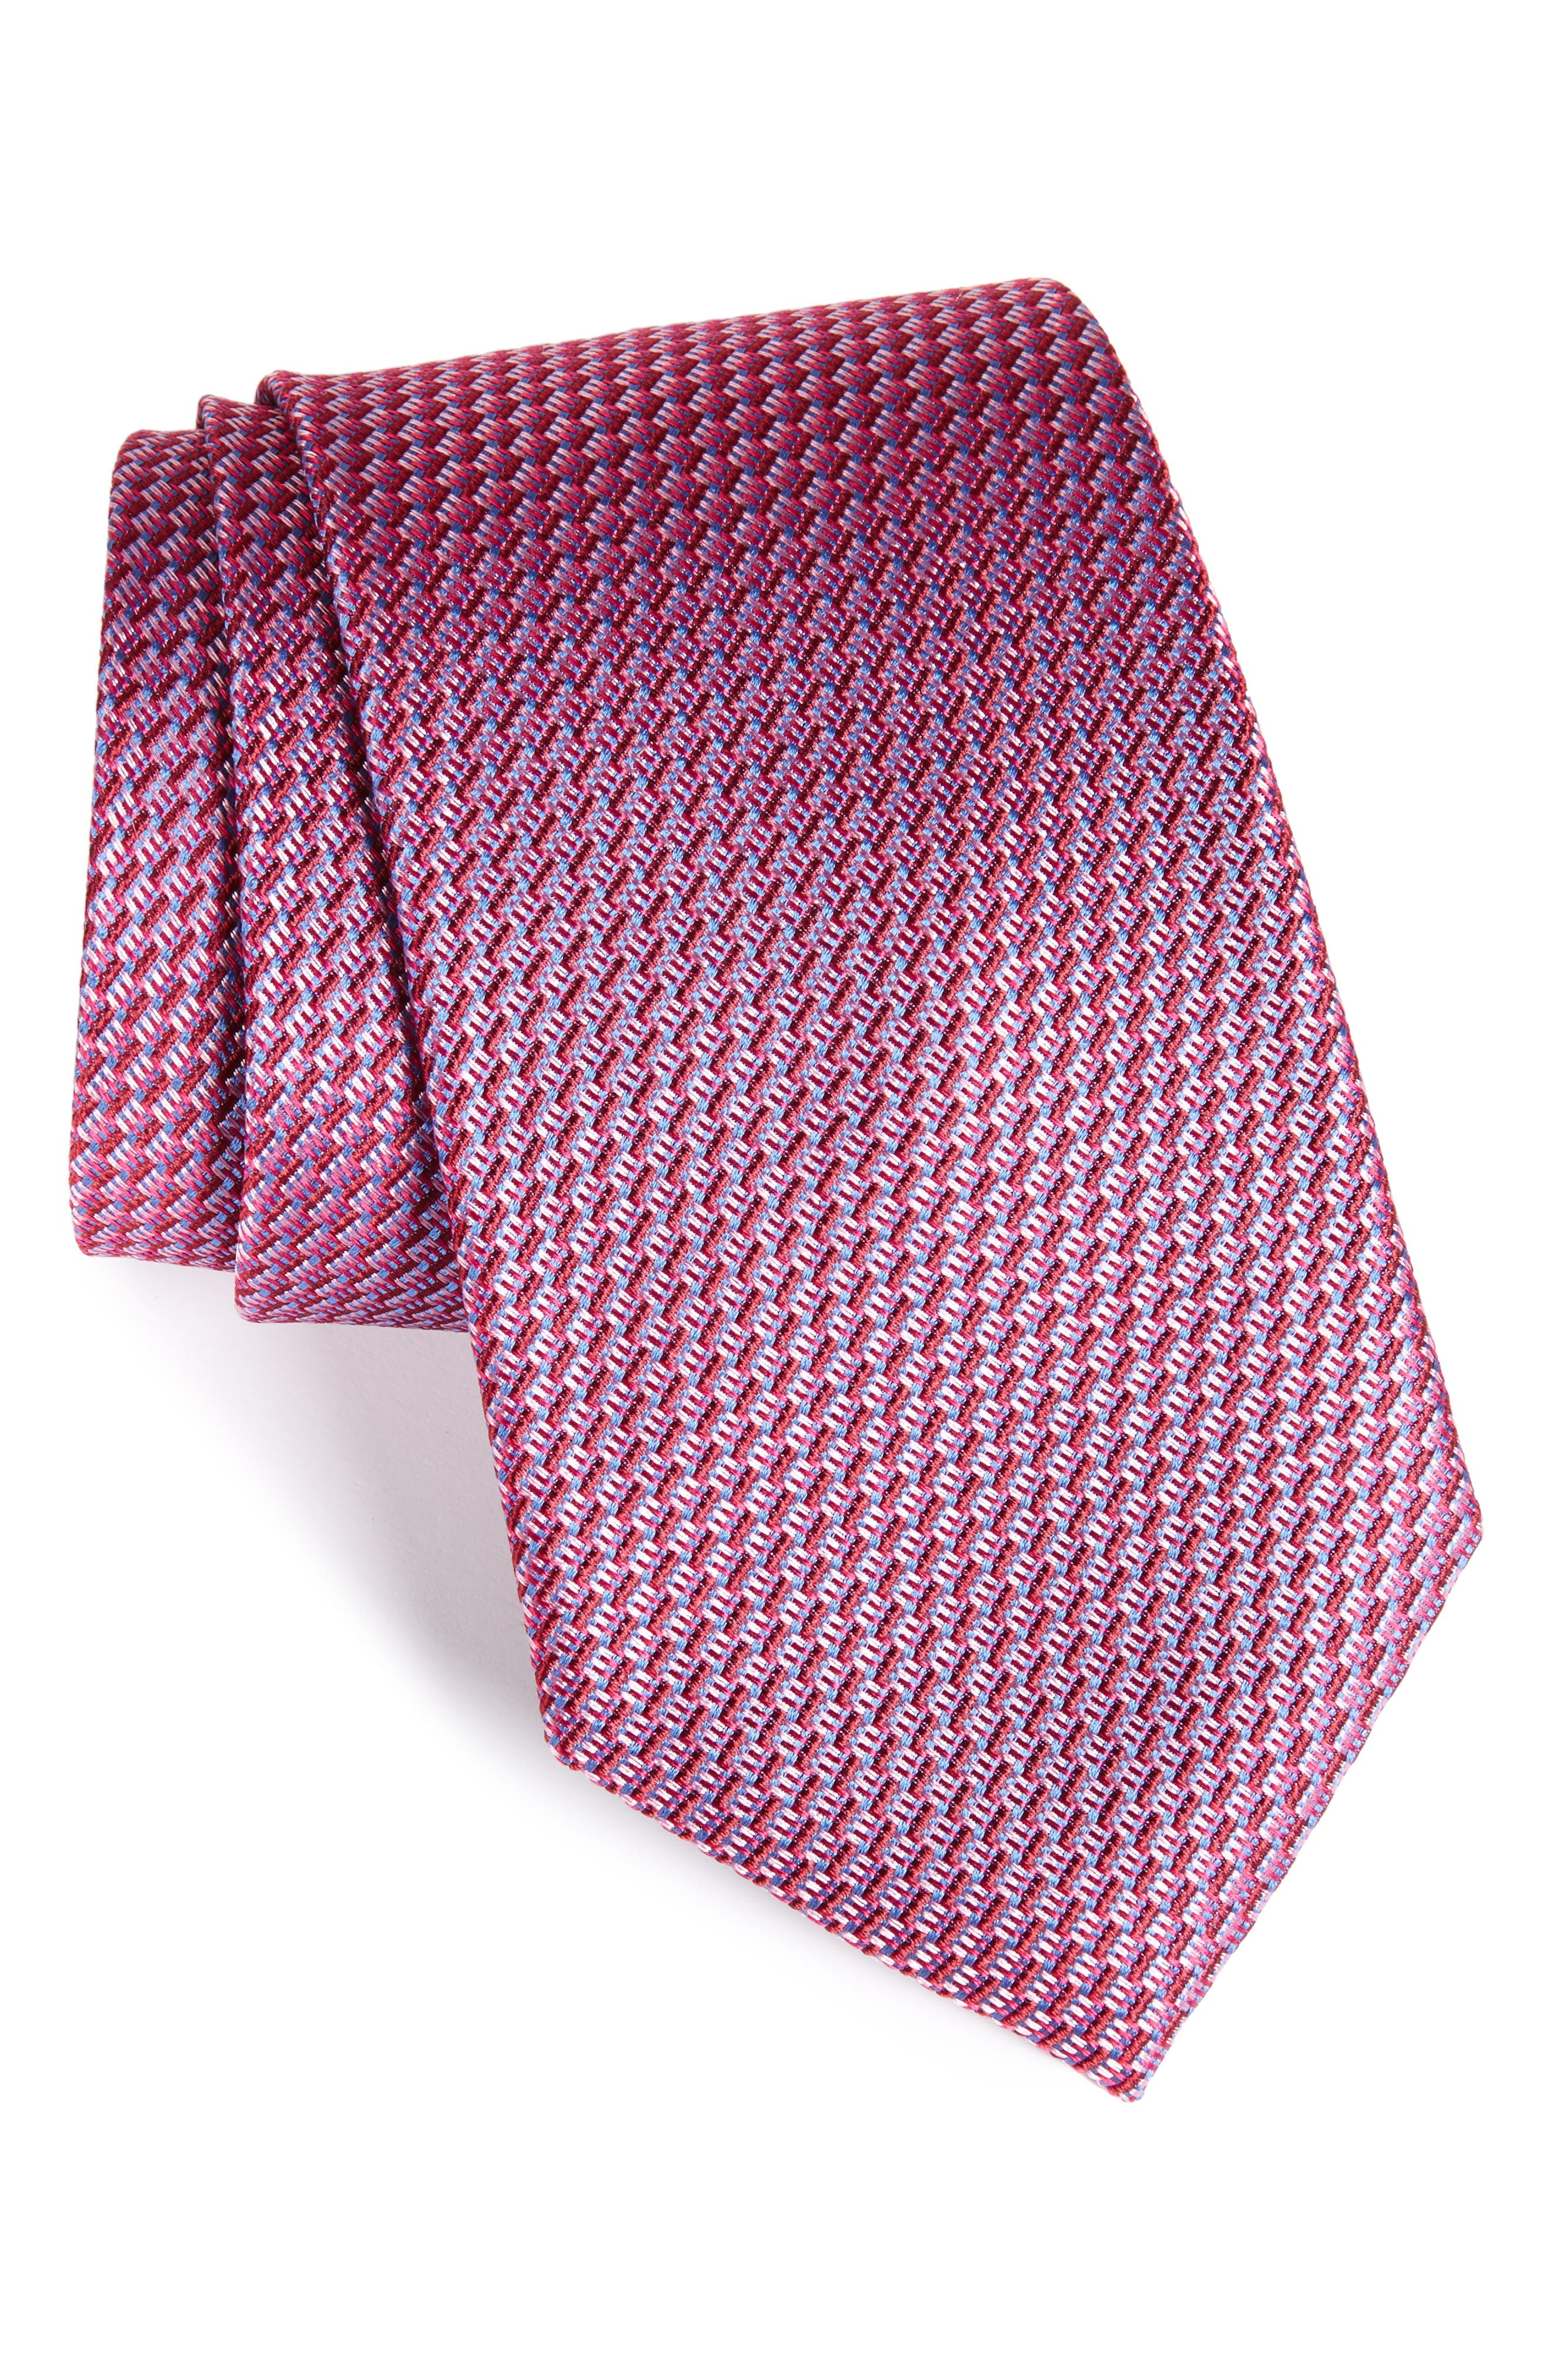 Main Image - Nordstrom Men's Shop Tech Woven Silk Tie (X-Long)